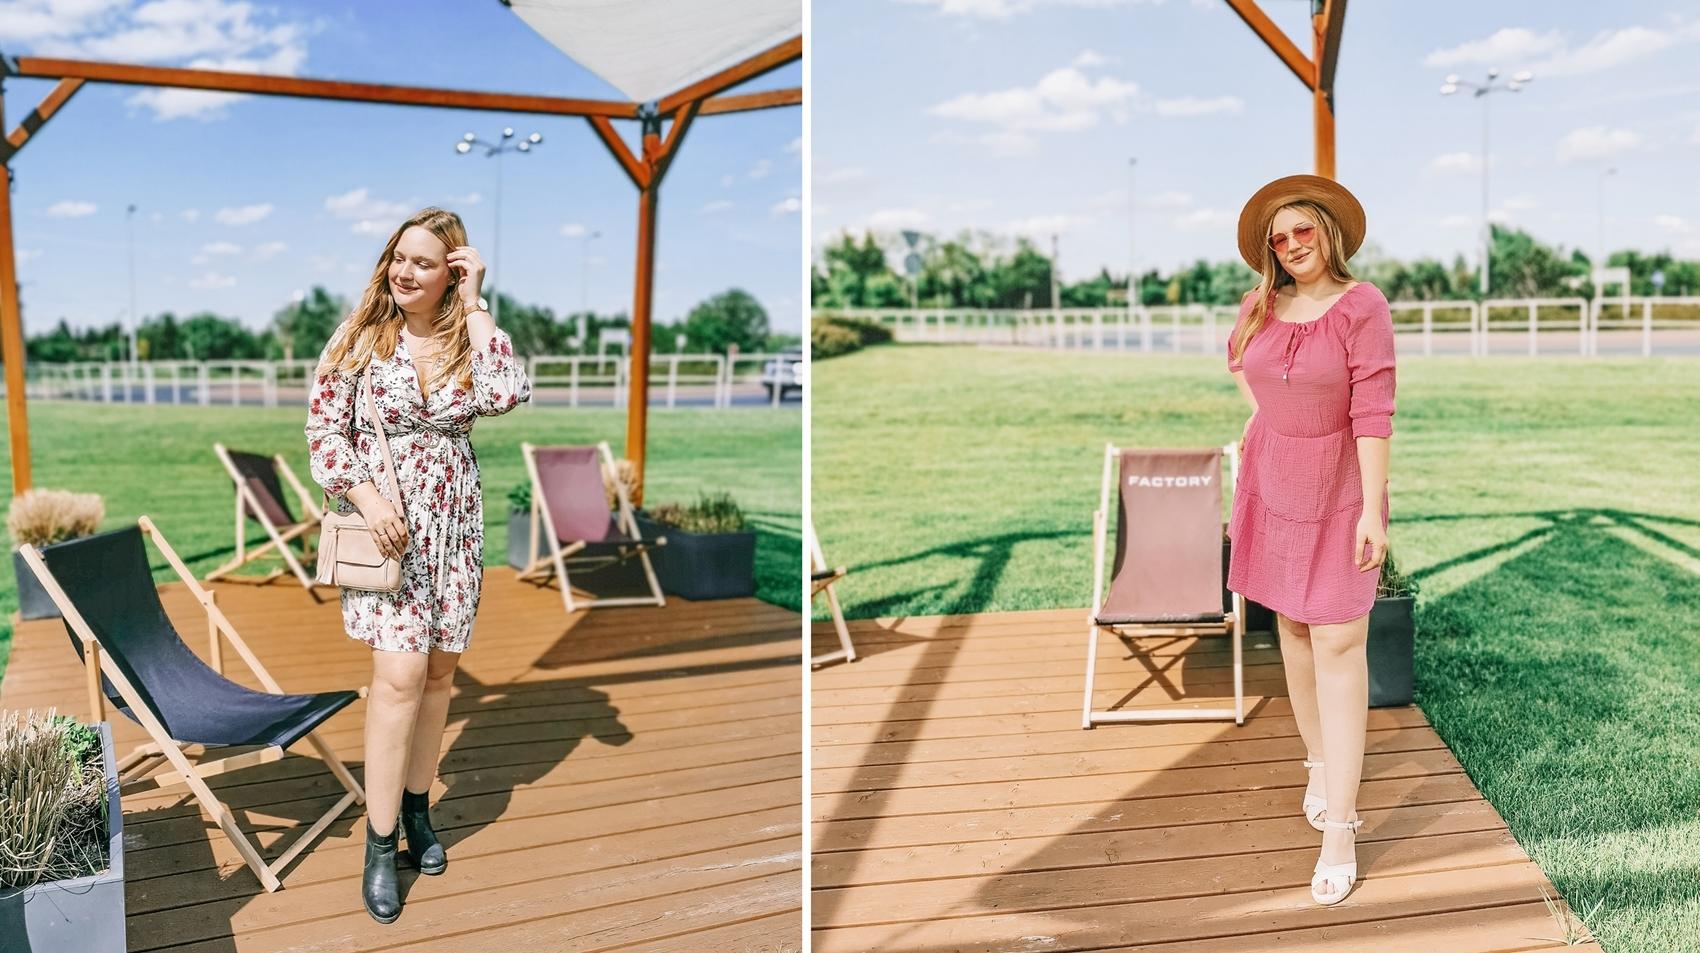 modne-sukienki-na-lato_sklep.jpg